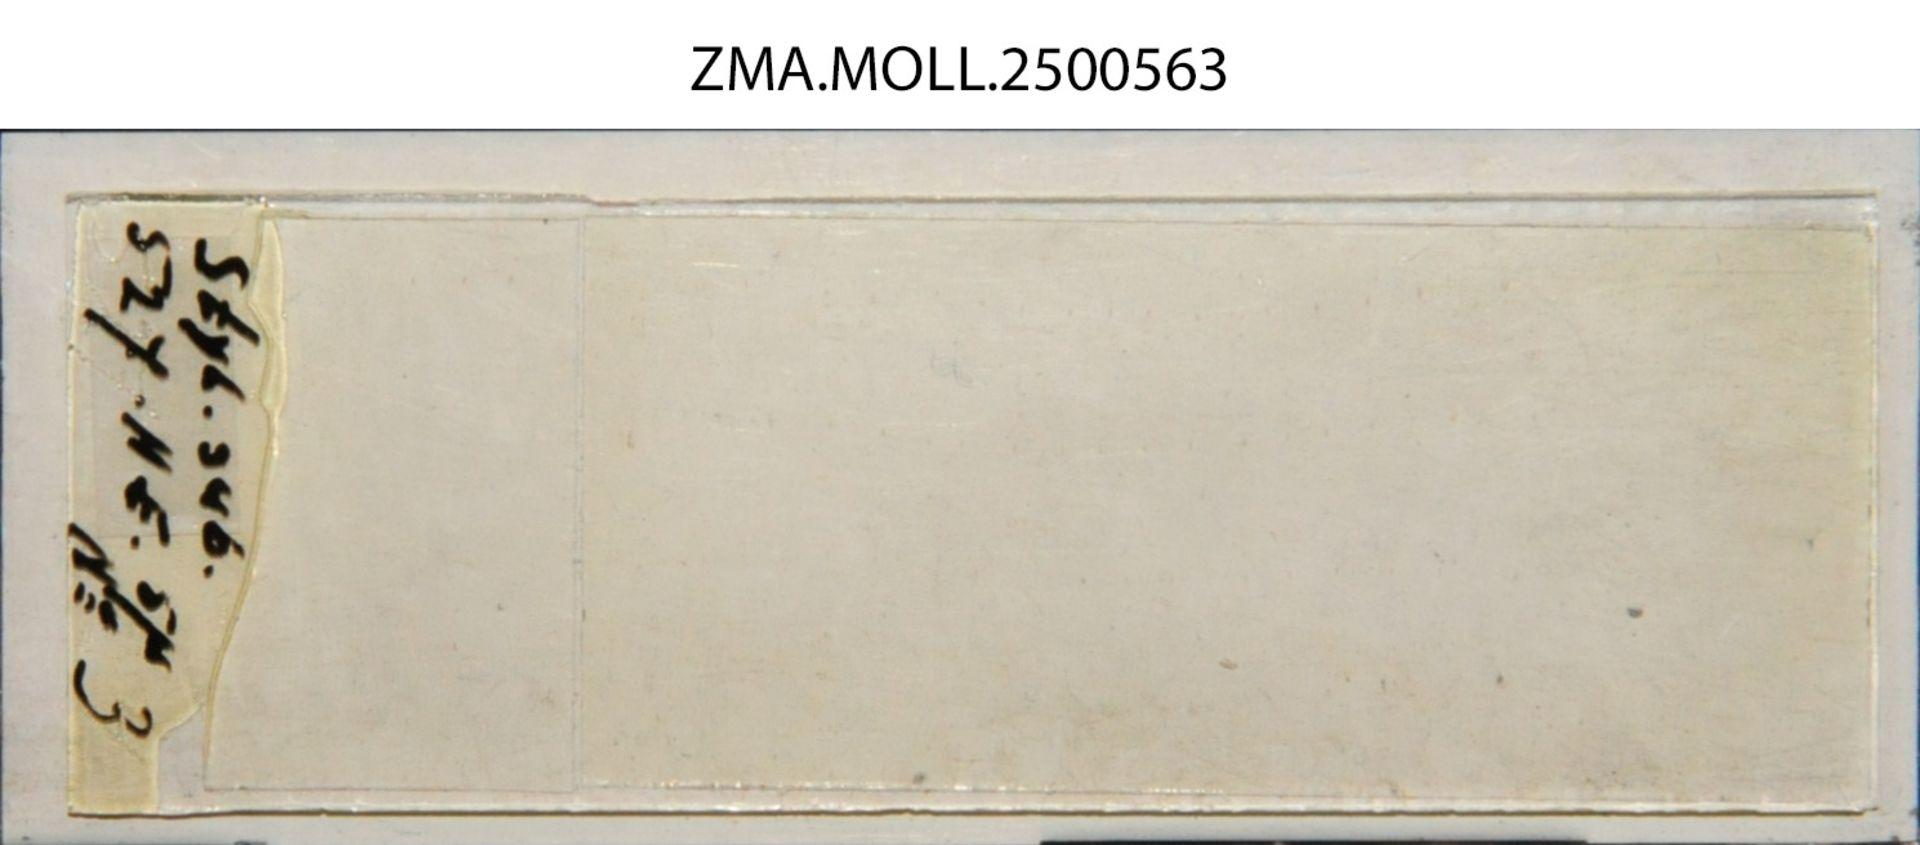 ZMA.MOLL.2500563   Styliola subula (Quoy & Gaimard, 1827)